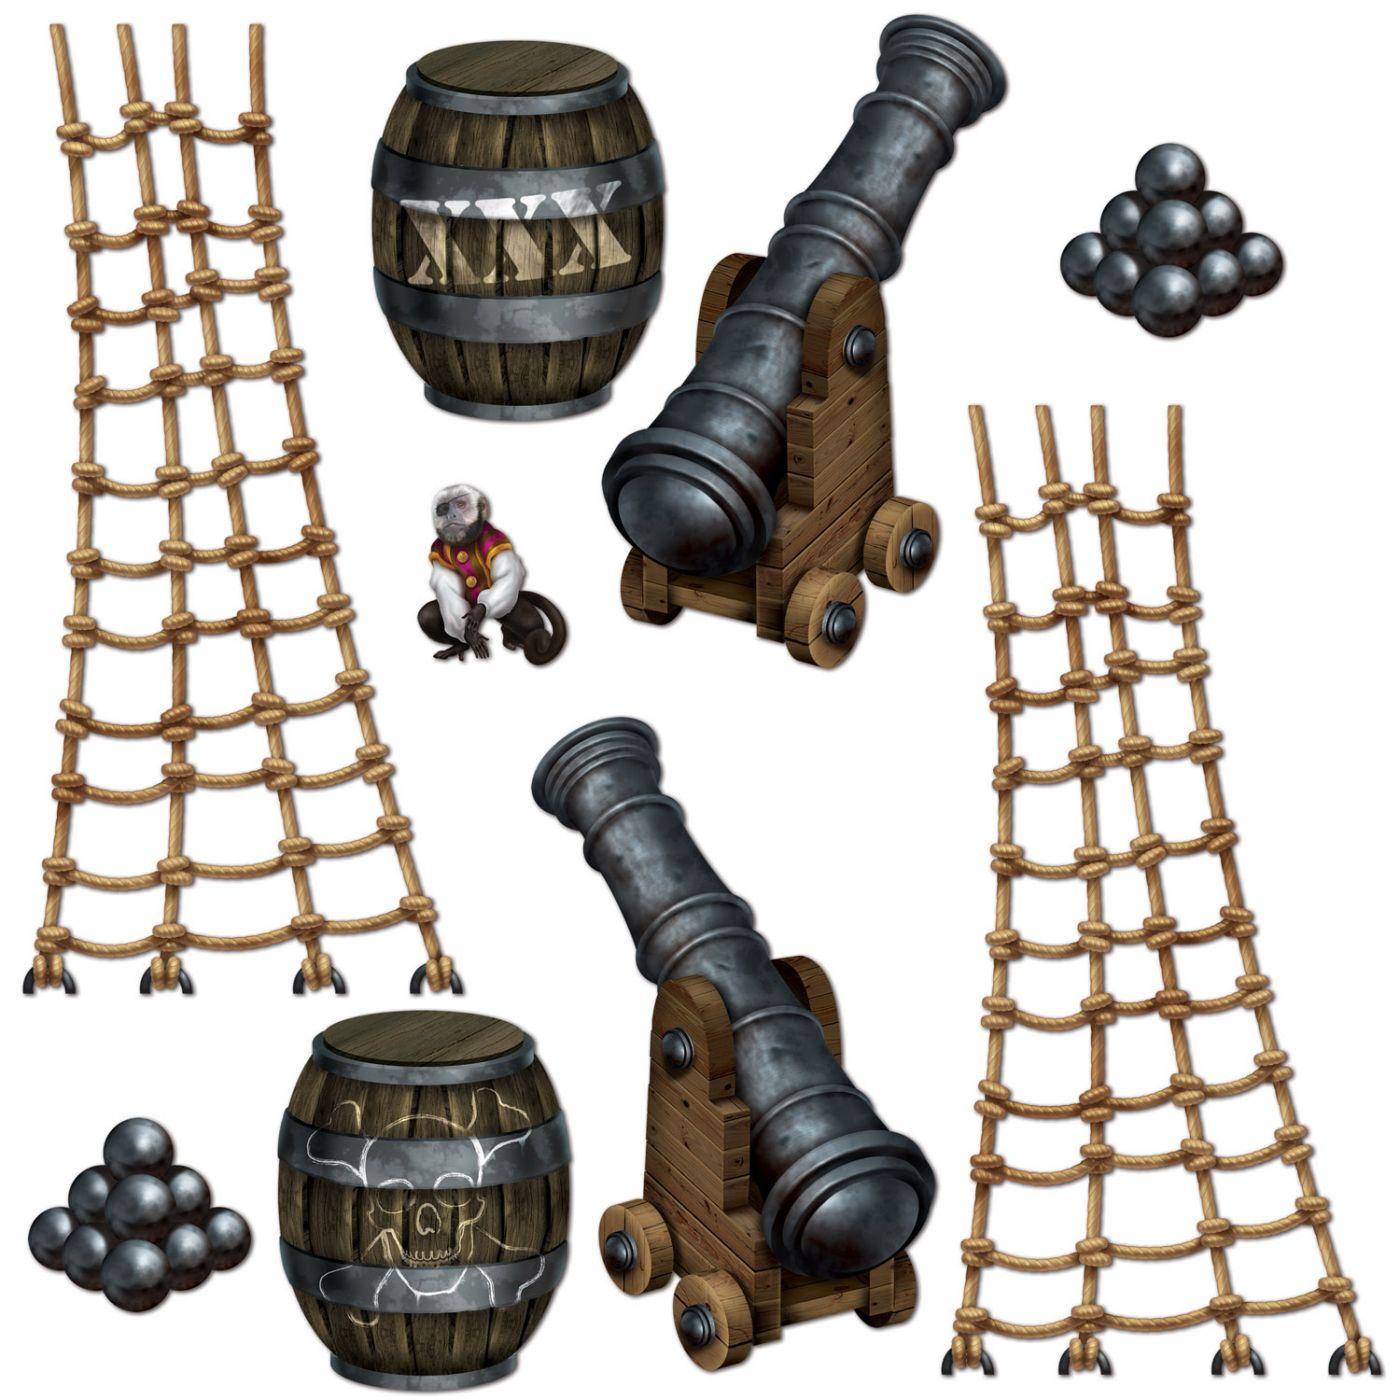 Pirate Ship Props image